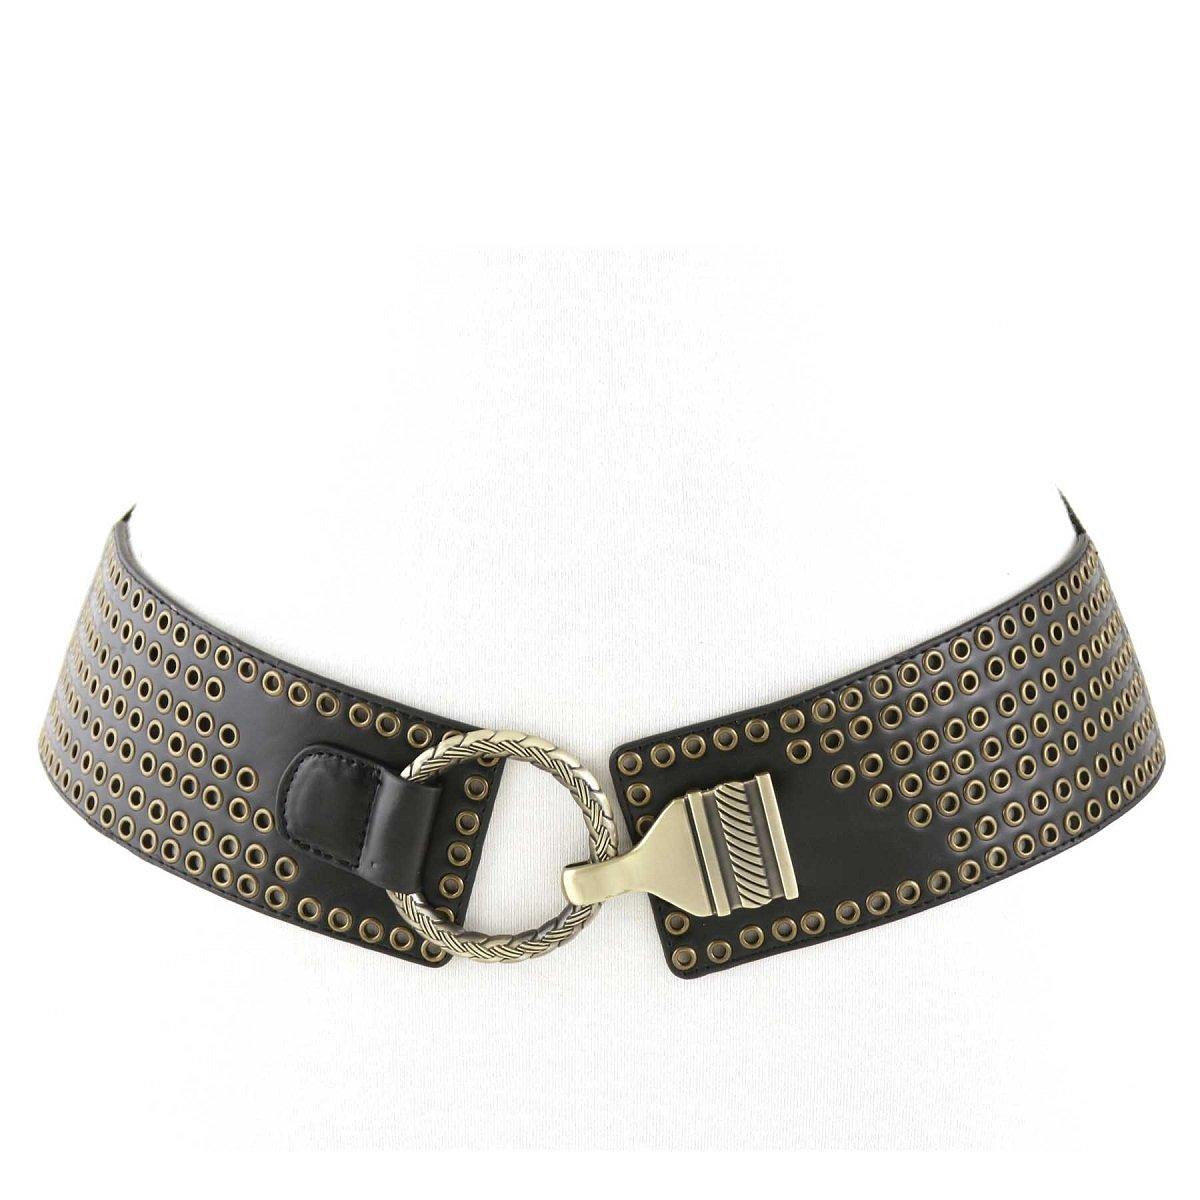 Women's Custom Circle Designed Closure Elastic Stretch Belt with Quality Grom...